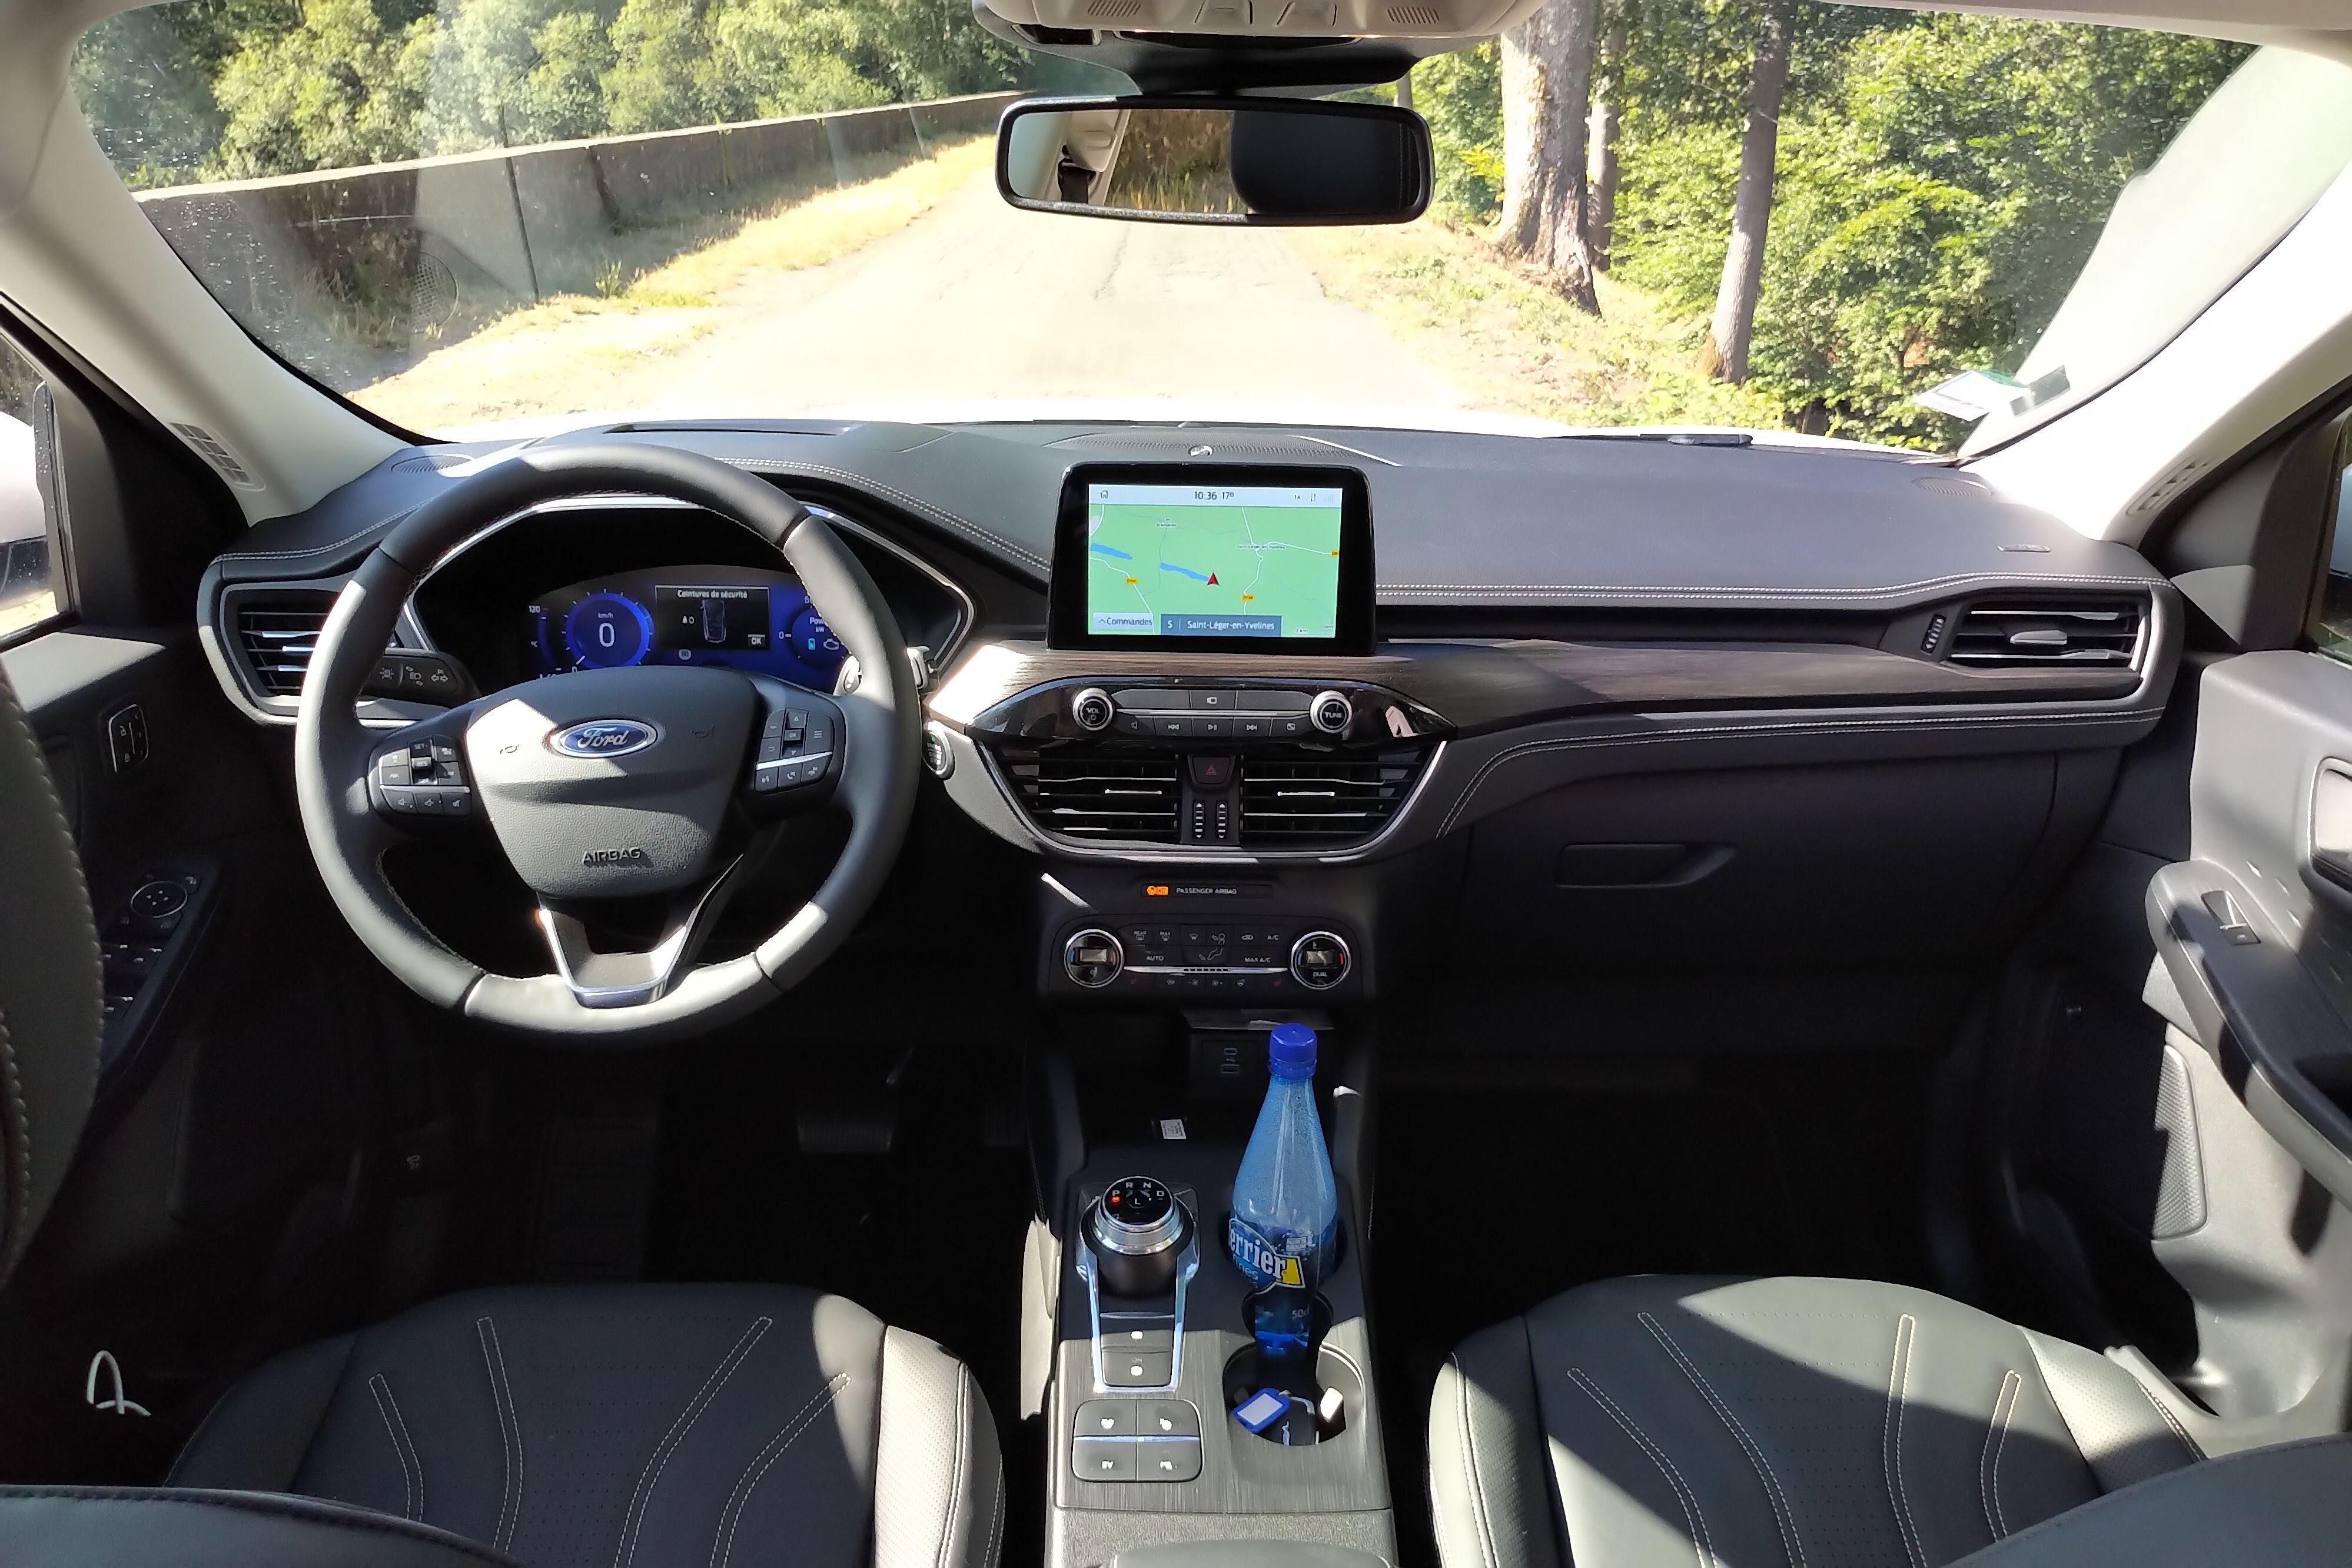 Ford Kuga PHEV 2021, économiquement attrayant - ESSAI PHOTOS